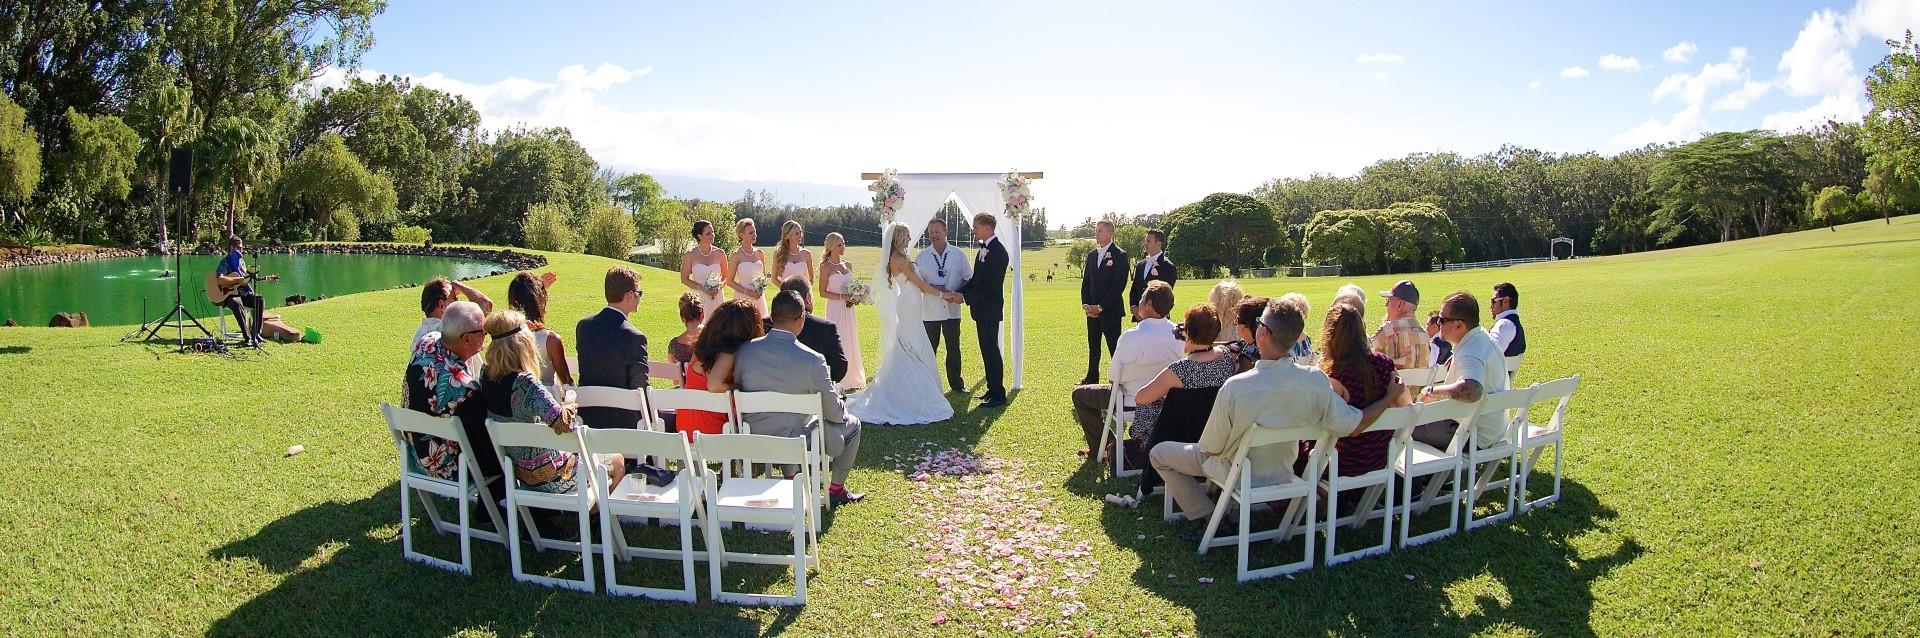 Tours Events Picnics Wedding Birthday Party Venues Oahu Hawaii